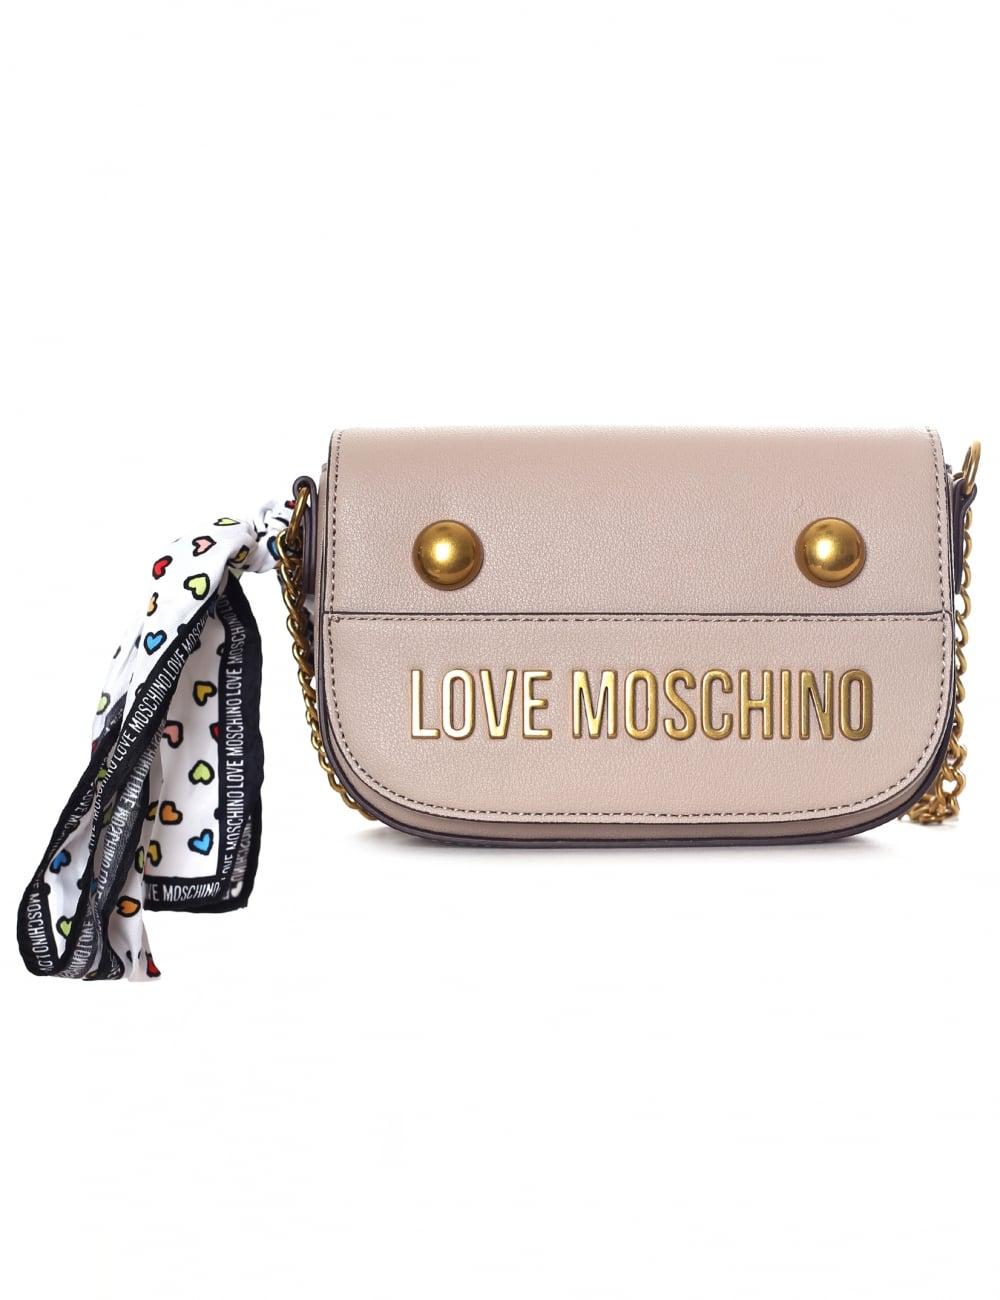 63c58f861a Love Moschino Studded Women s Crossbody Chain Bag